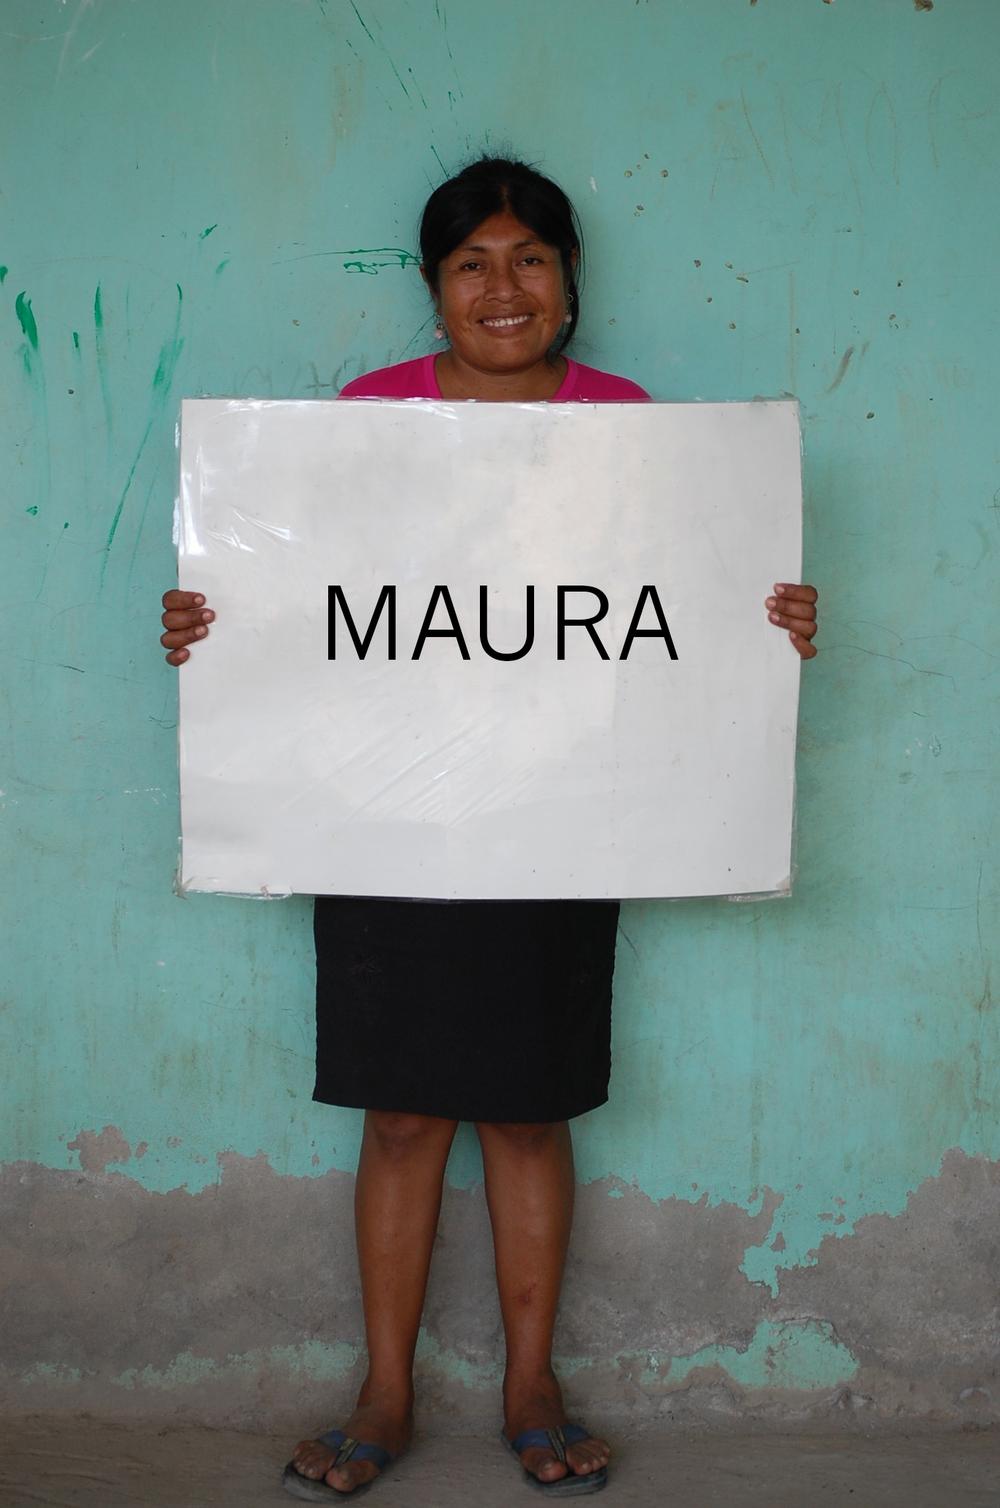 MAURA.png